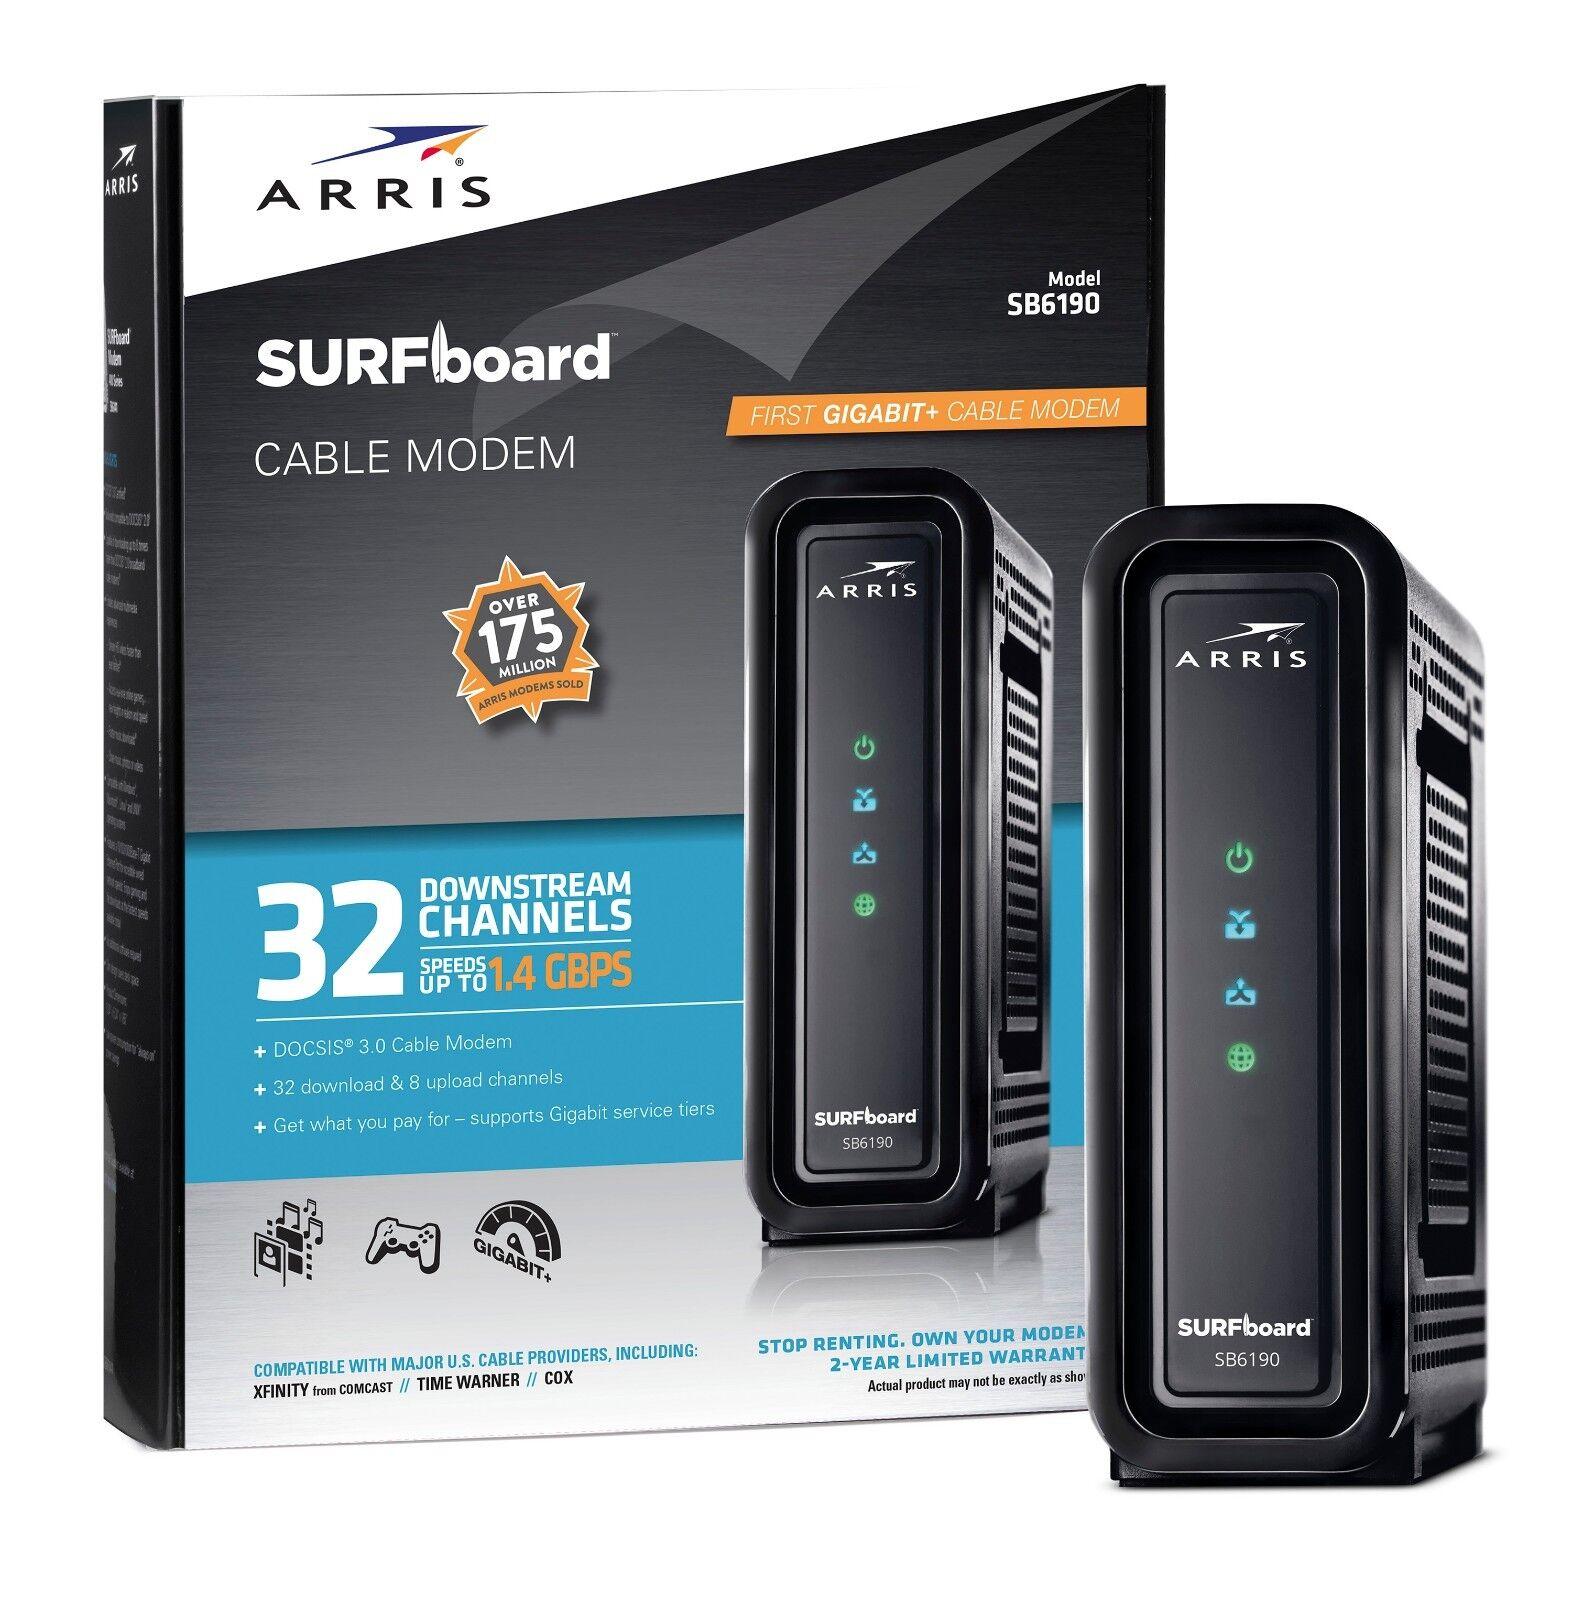 Arris Surfboard Black Sb6190 Docsis 3.0 Cable Modem Inter...